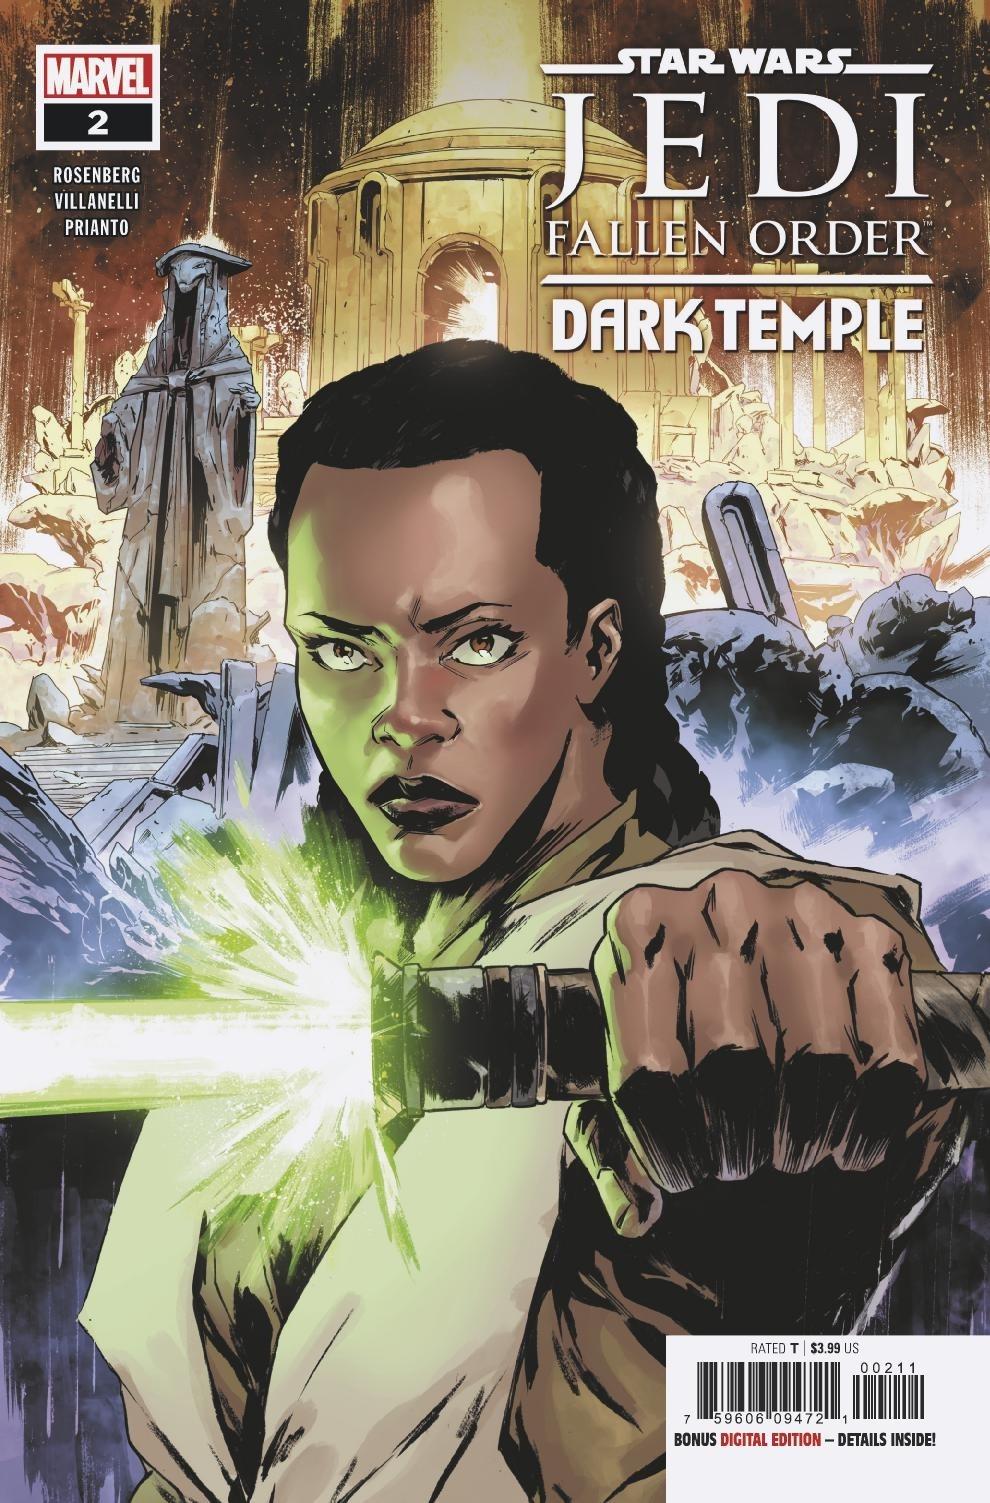 Jedi: Fallen Order: Dark Temple #2 (25.09.2019)